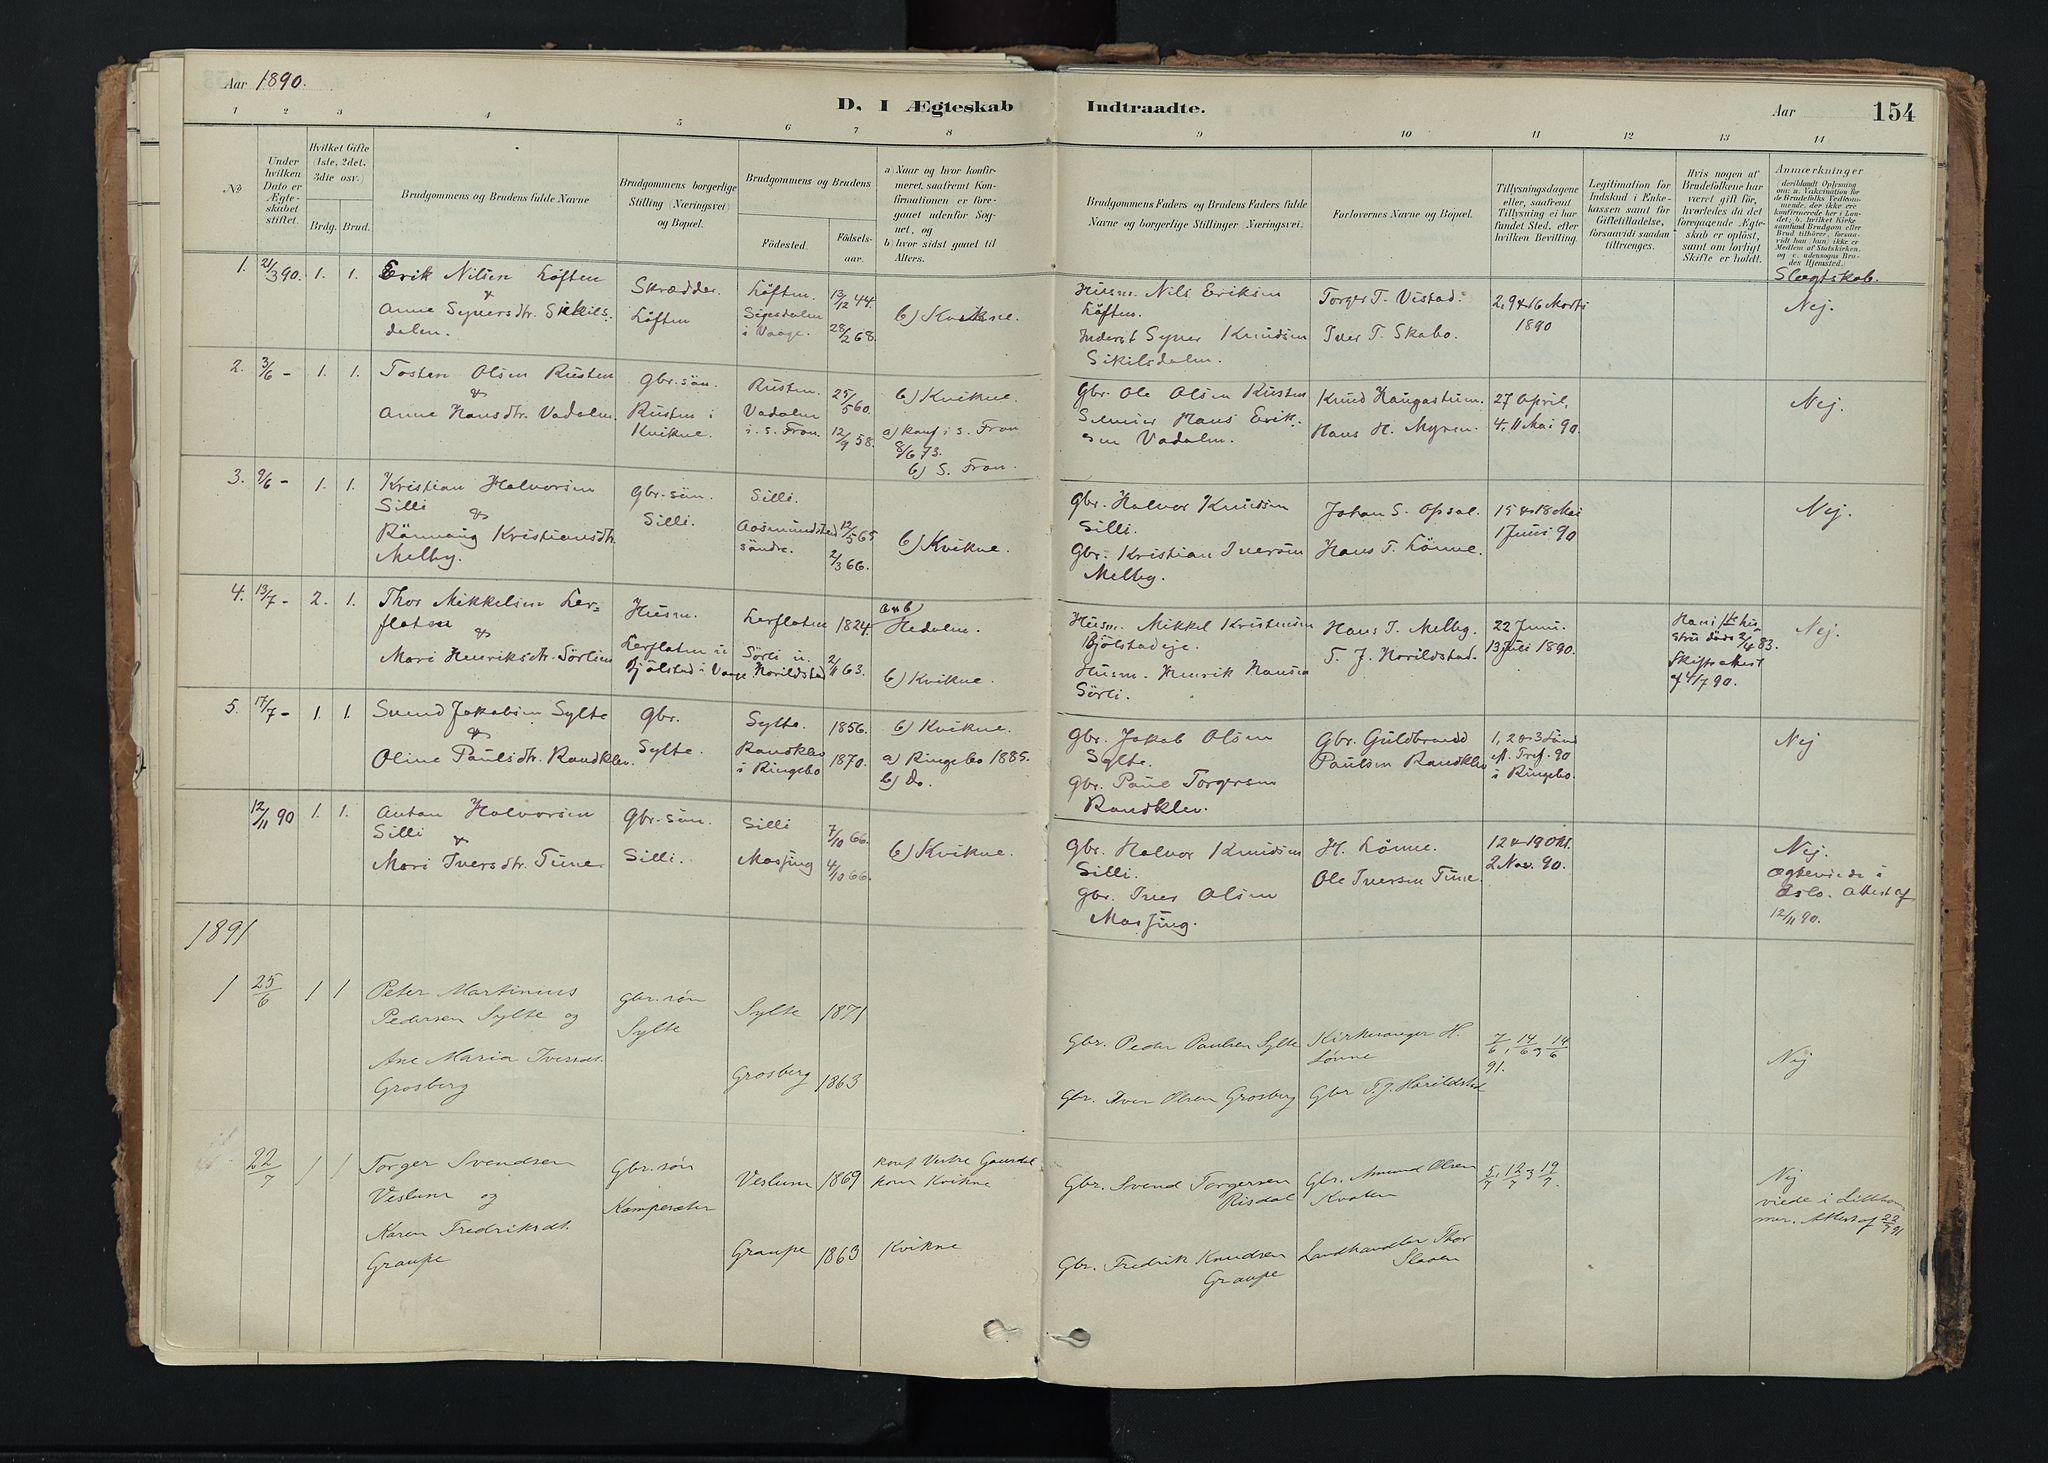 SAH, Nord-Fron prestekontor, Ministerialbok nr. 5, 1884-1914, s. 154